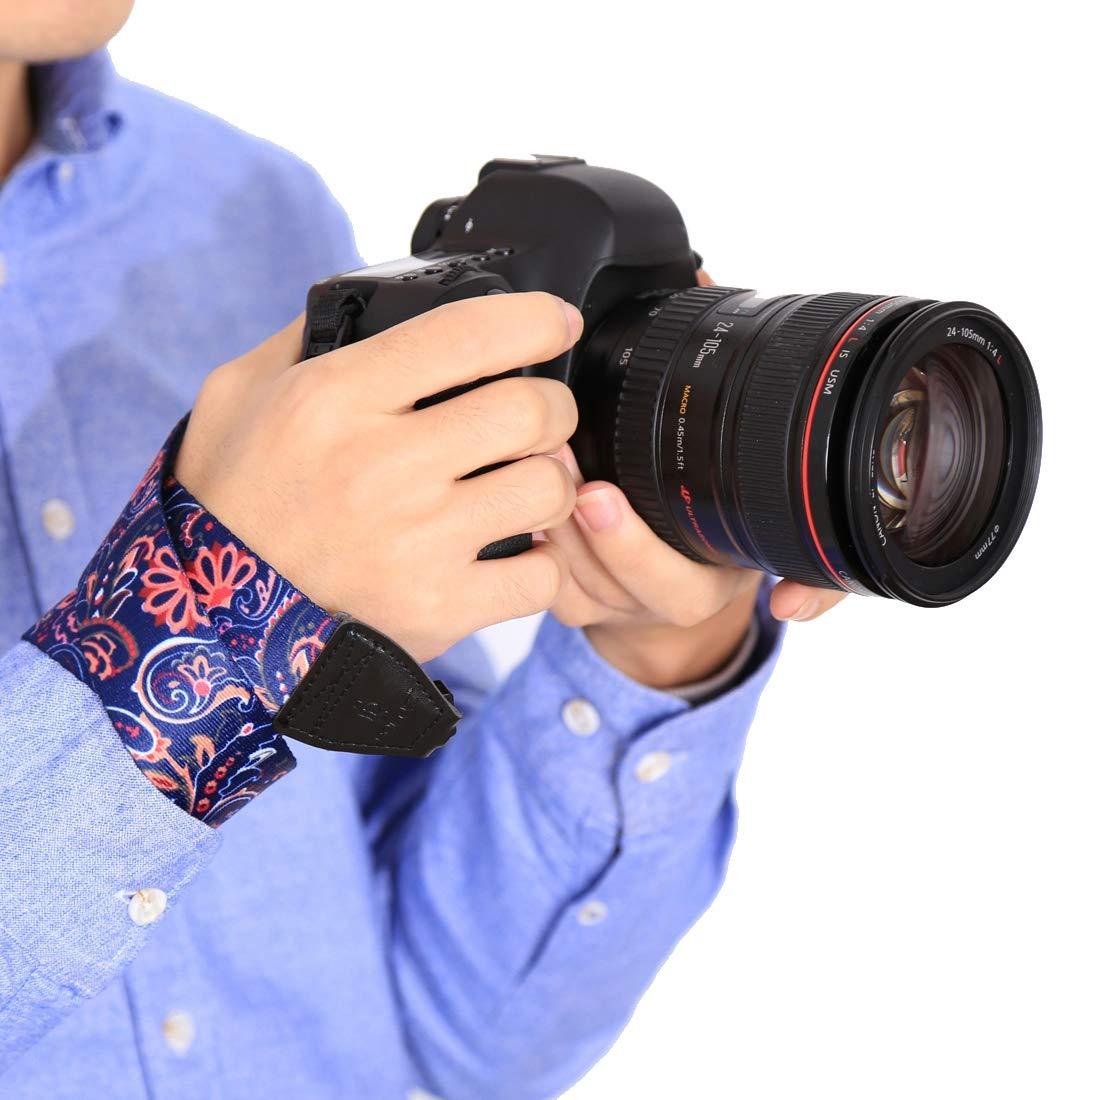 Color : Color2 Retro Ethnic Style Multi-Color Series Shoulder Neck Strap Camera Strap for SLR//DSLR Cameras